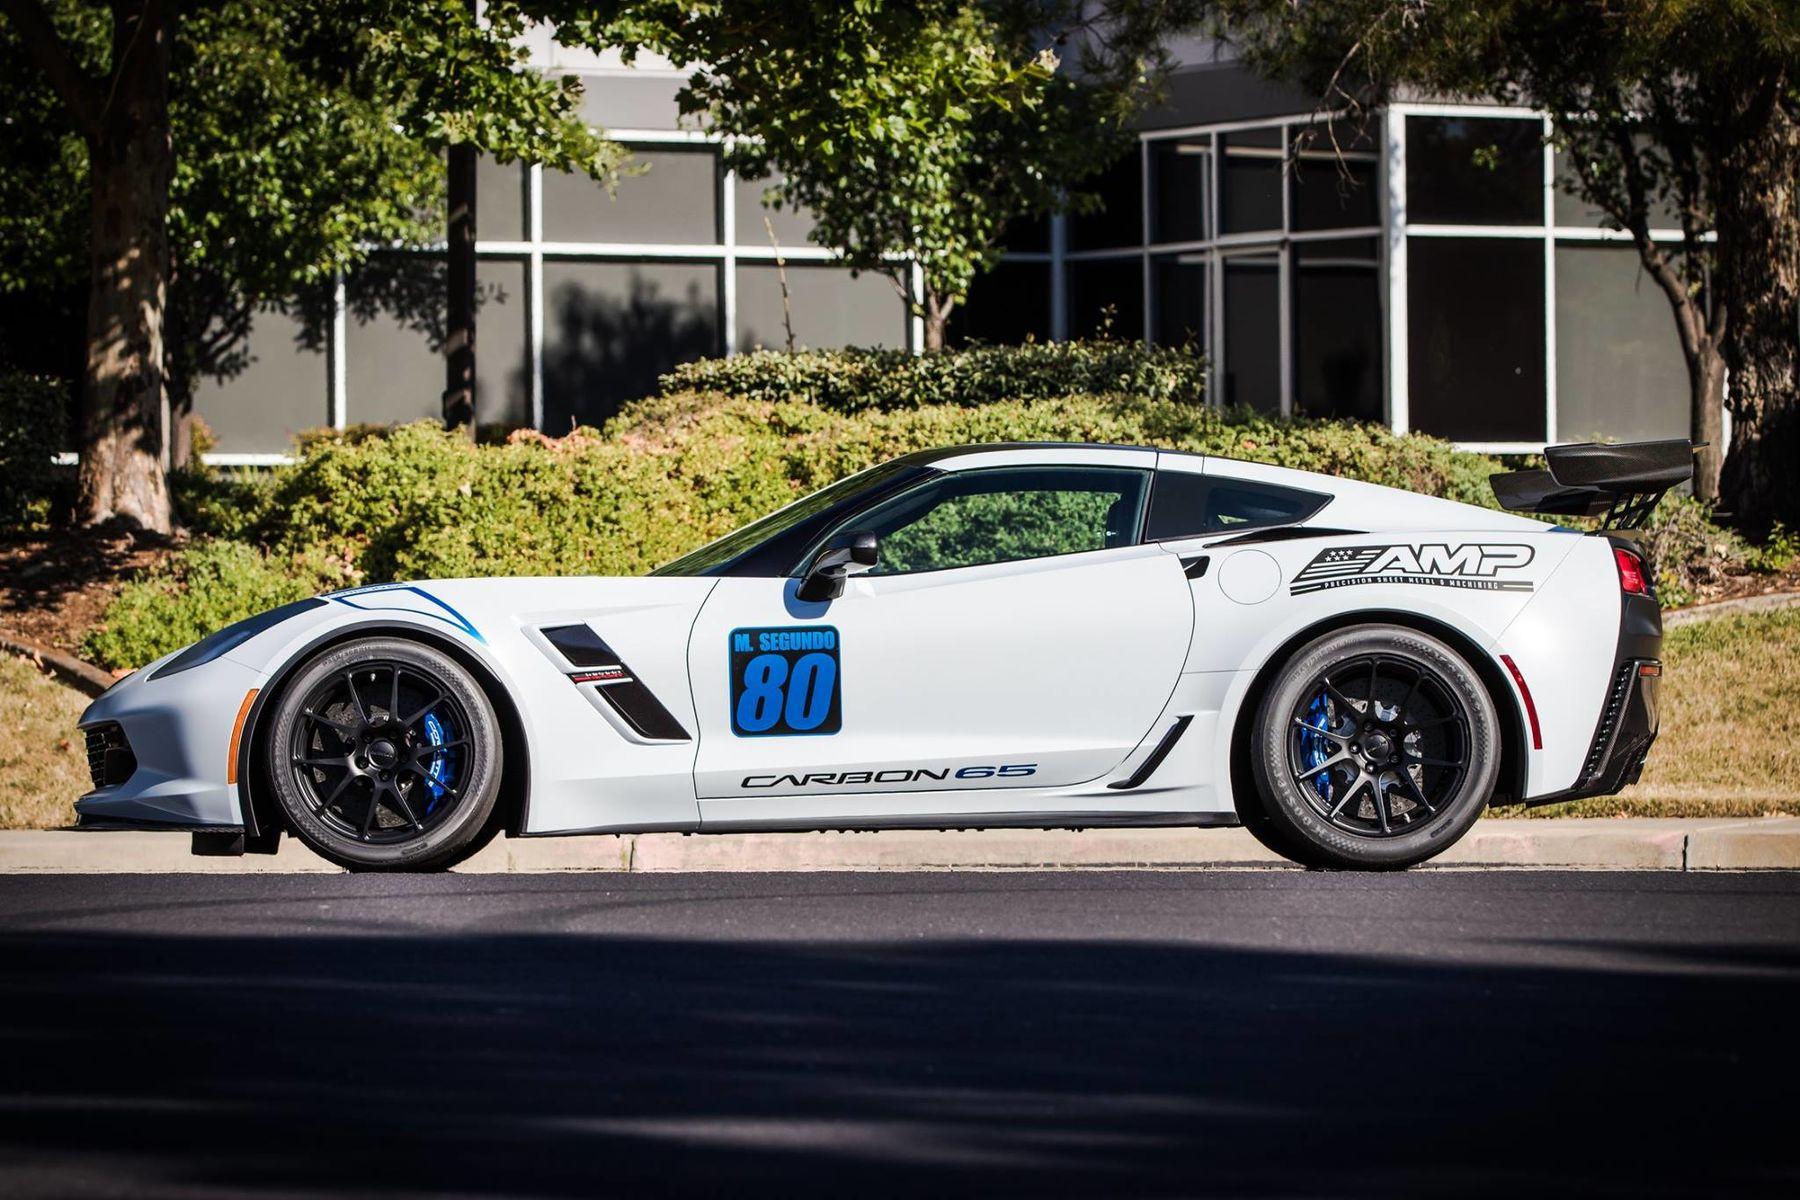 2018 Chevrolet Corvette Z06 | Mike's C7 Corvette Grand Sport on Forgeline One Piece Forged Monoblock GA1R Wheels